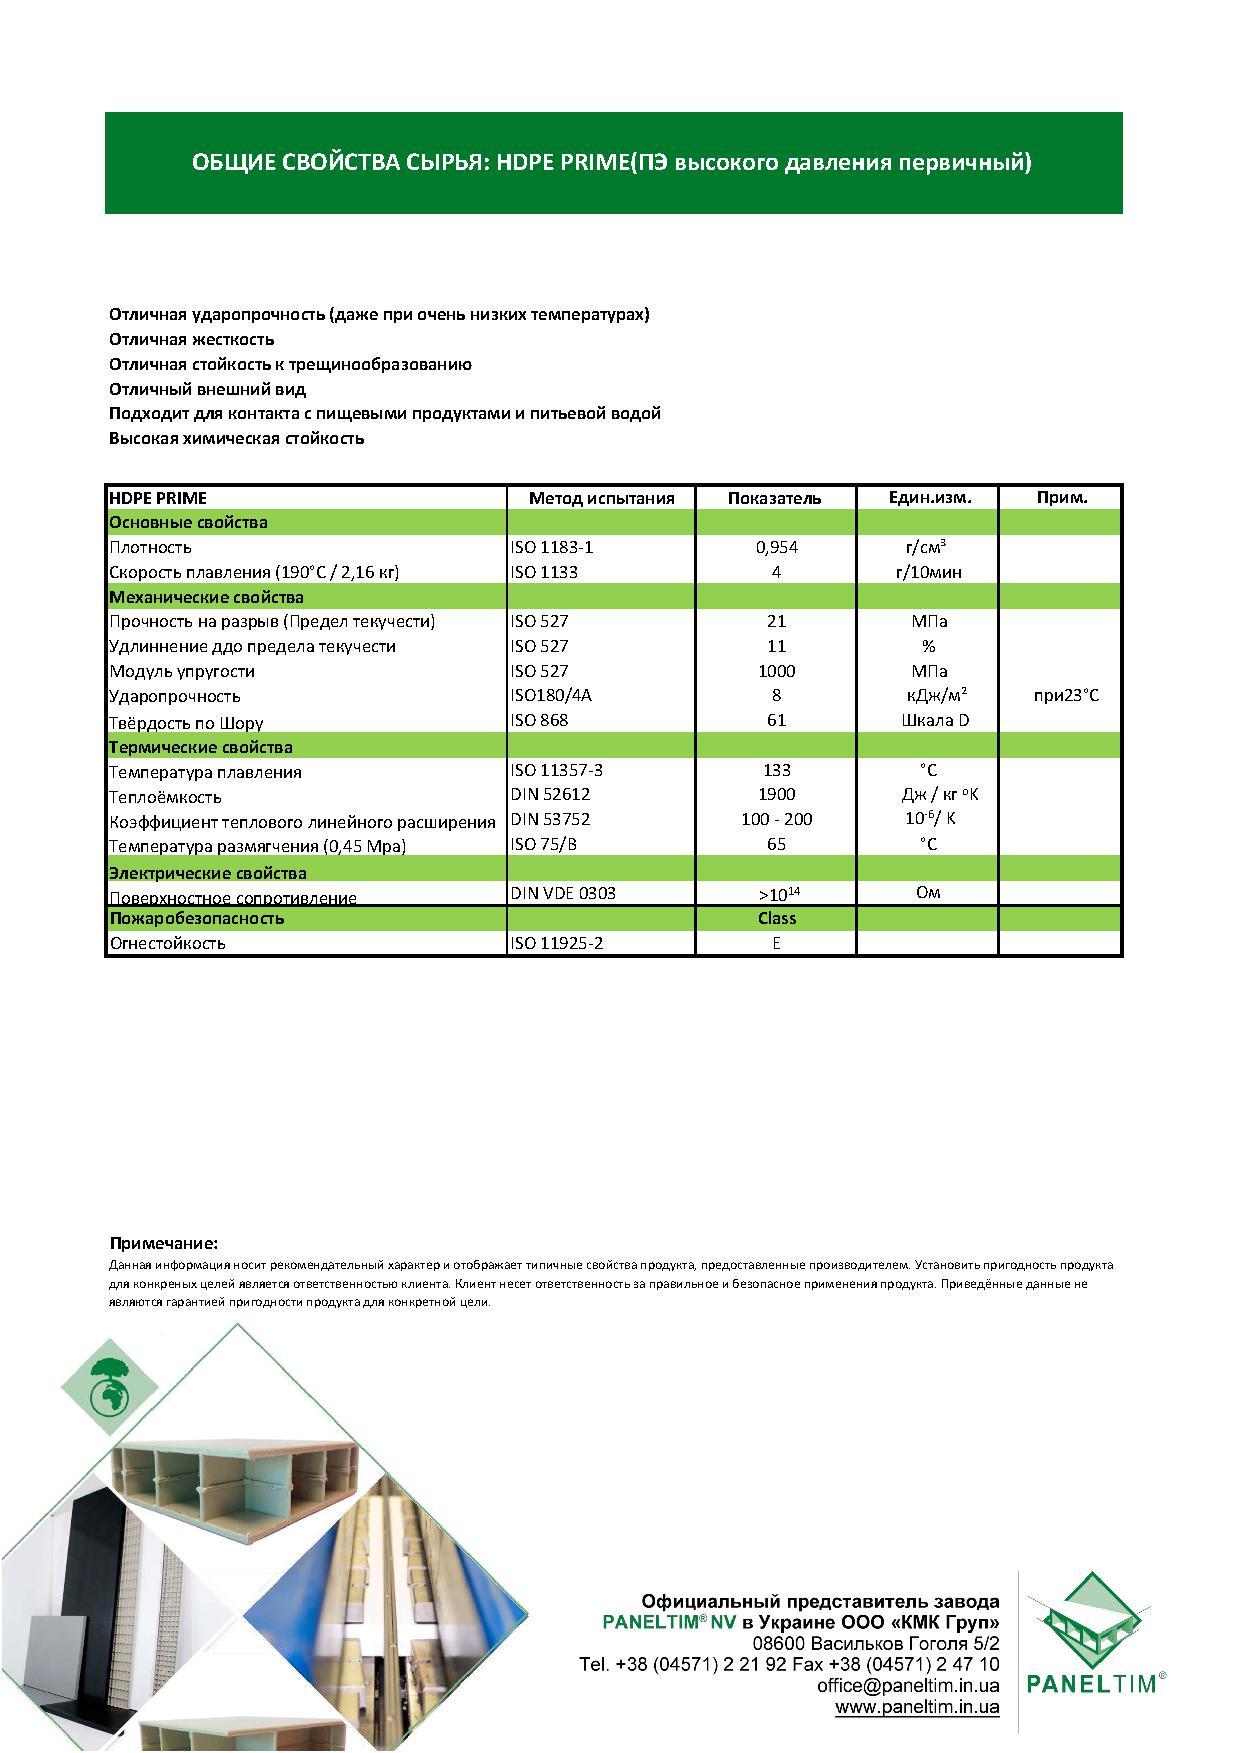 Характеристики сырья HDPE Prime